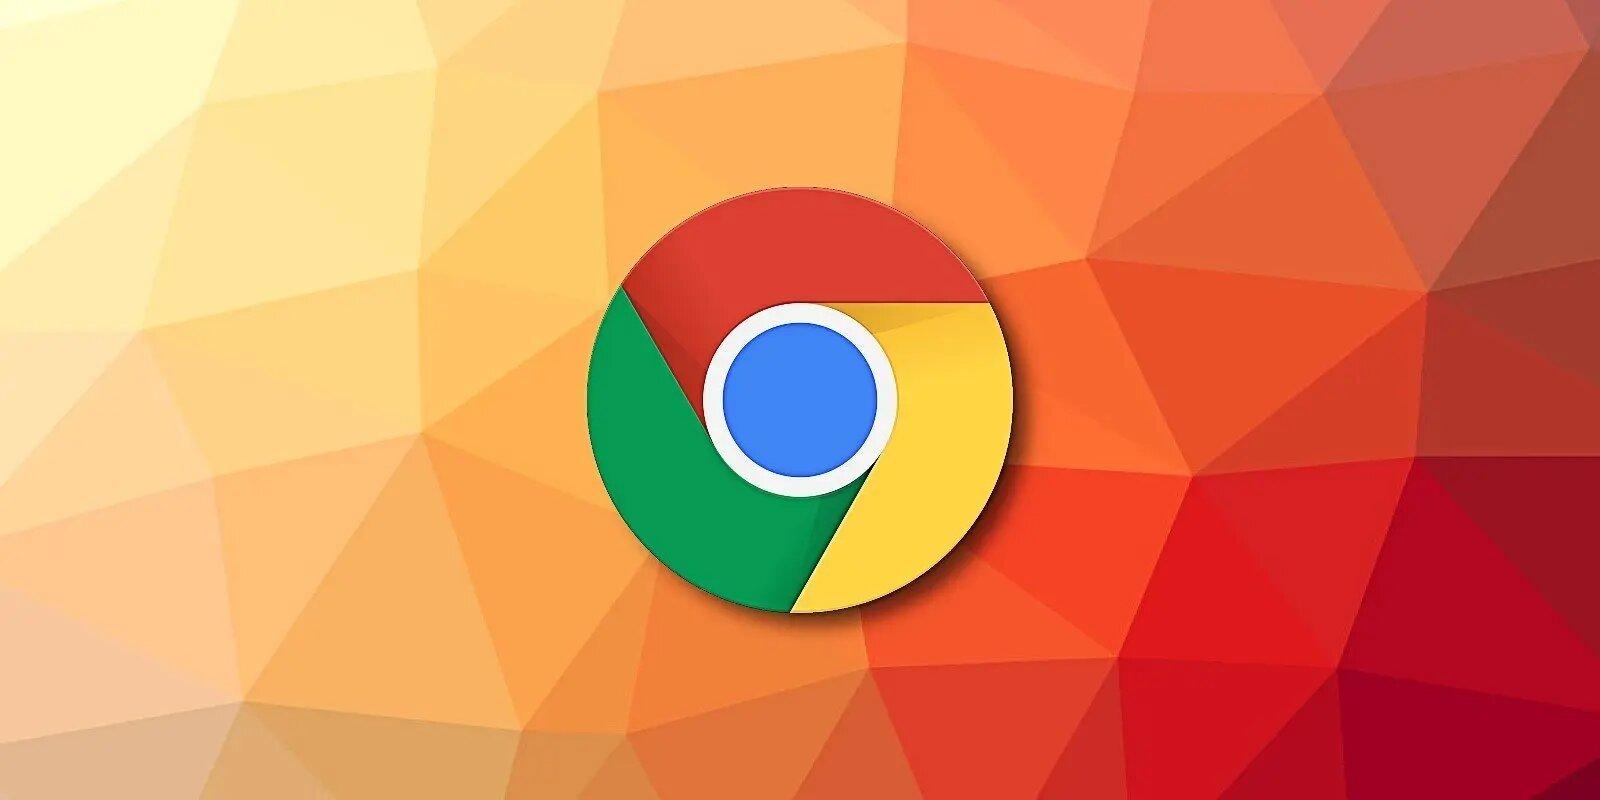 chrome - Chrome θα κρύβει πλέον τις web ειδοποιήσεις